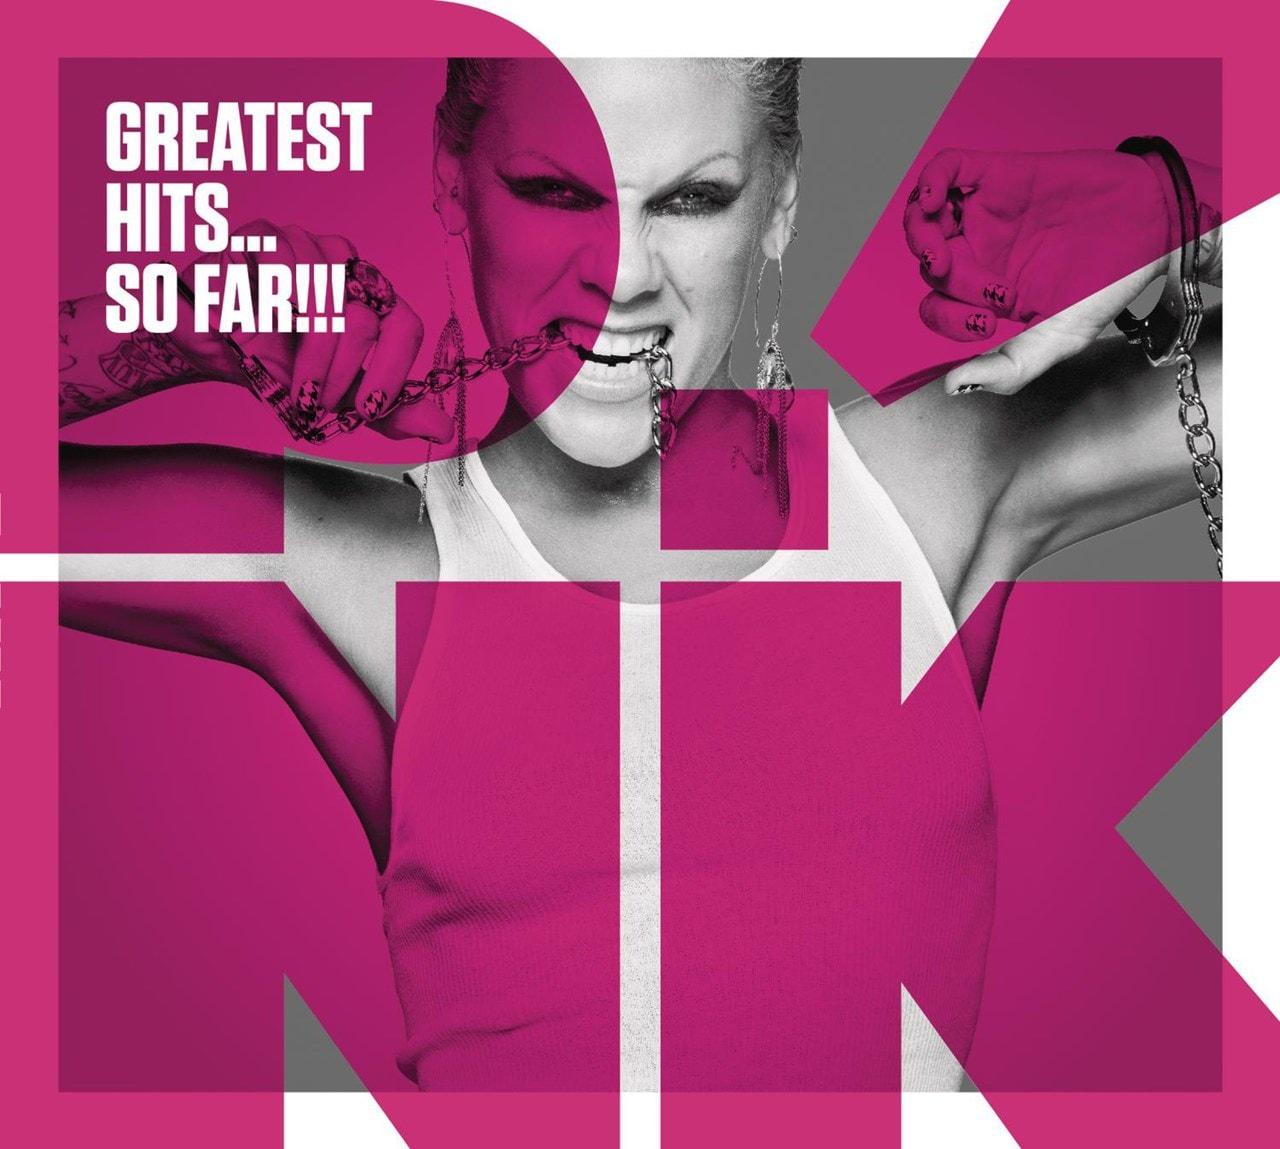 Greatest Hits... So Far!!! - 1